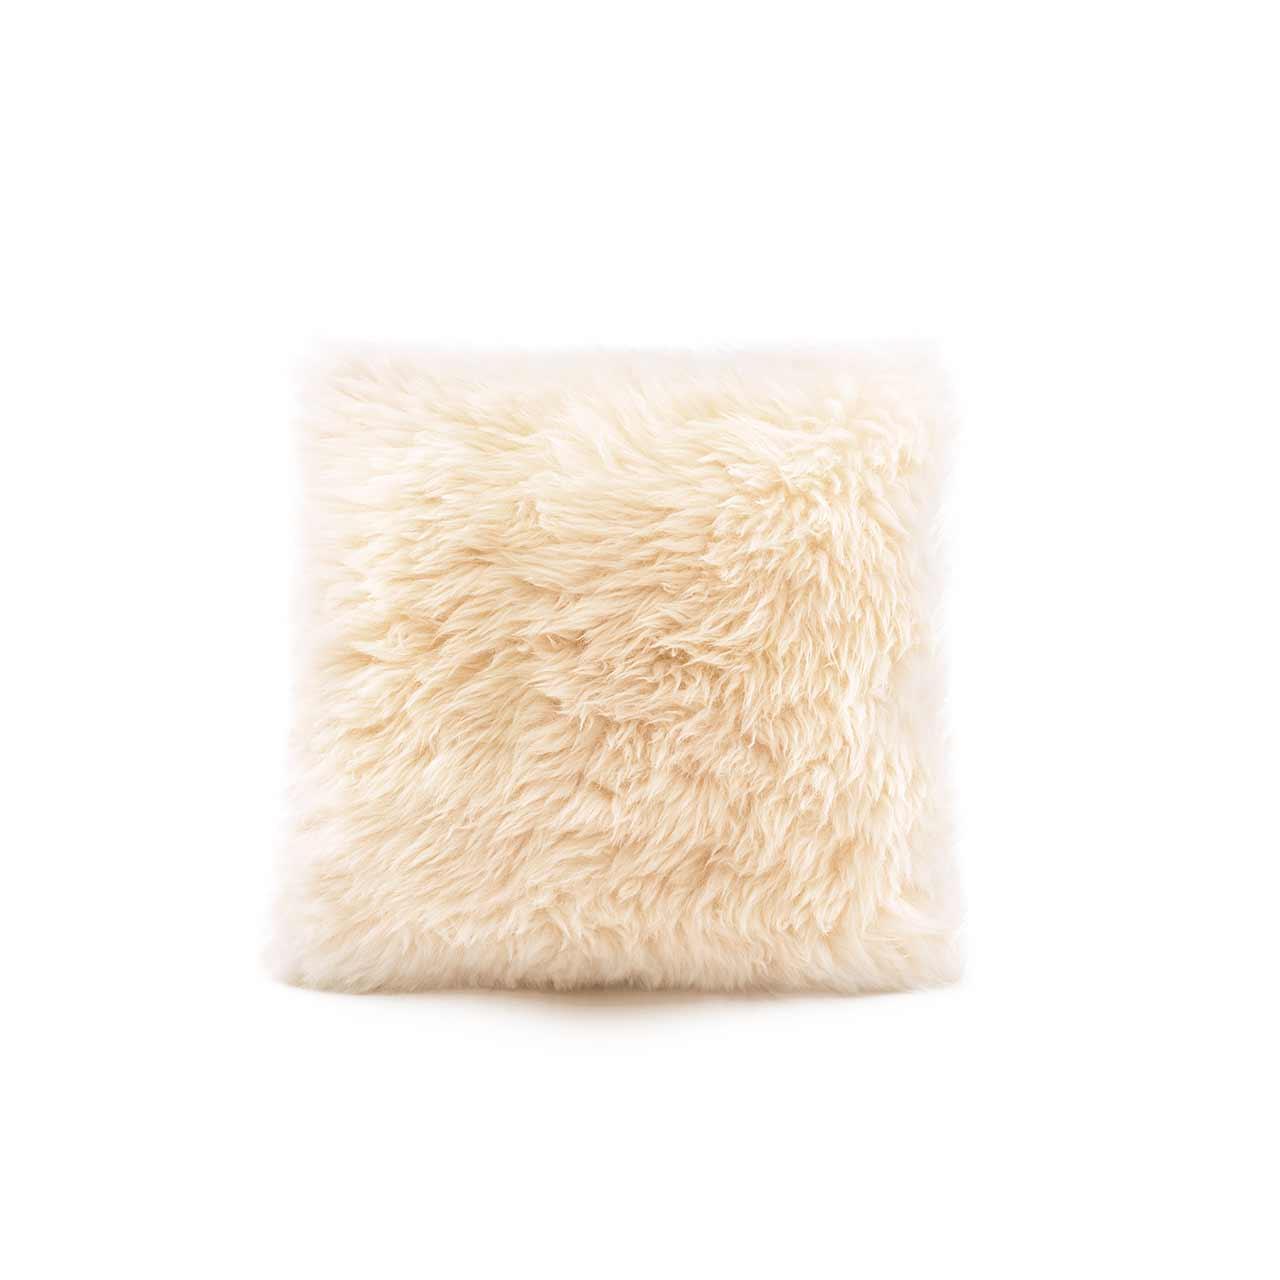 woola_long_wool_sheepskin_cushion_natural_square